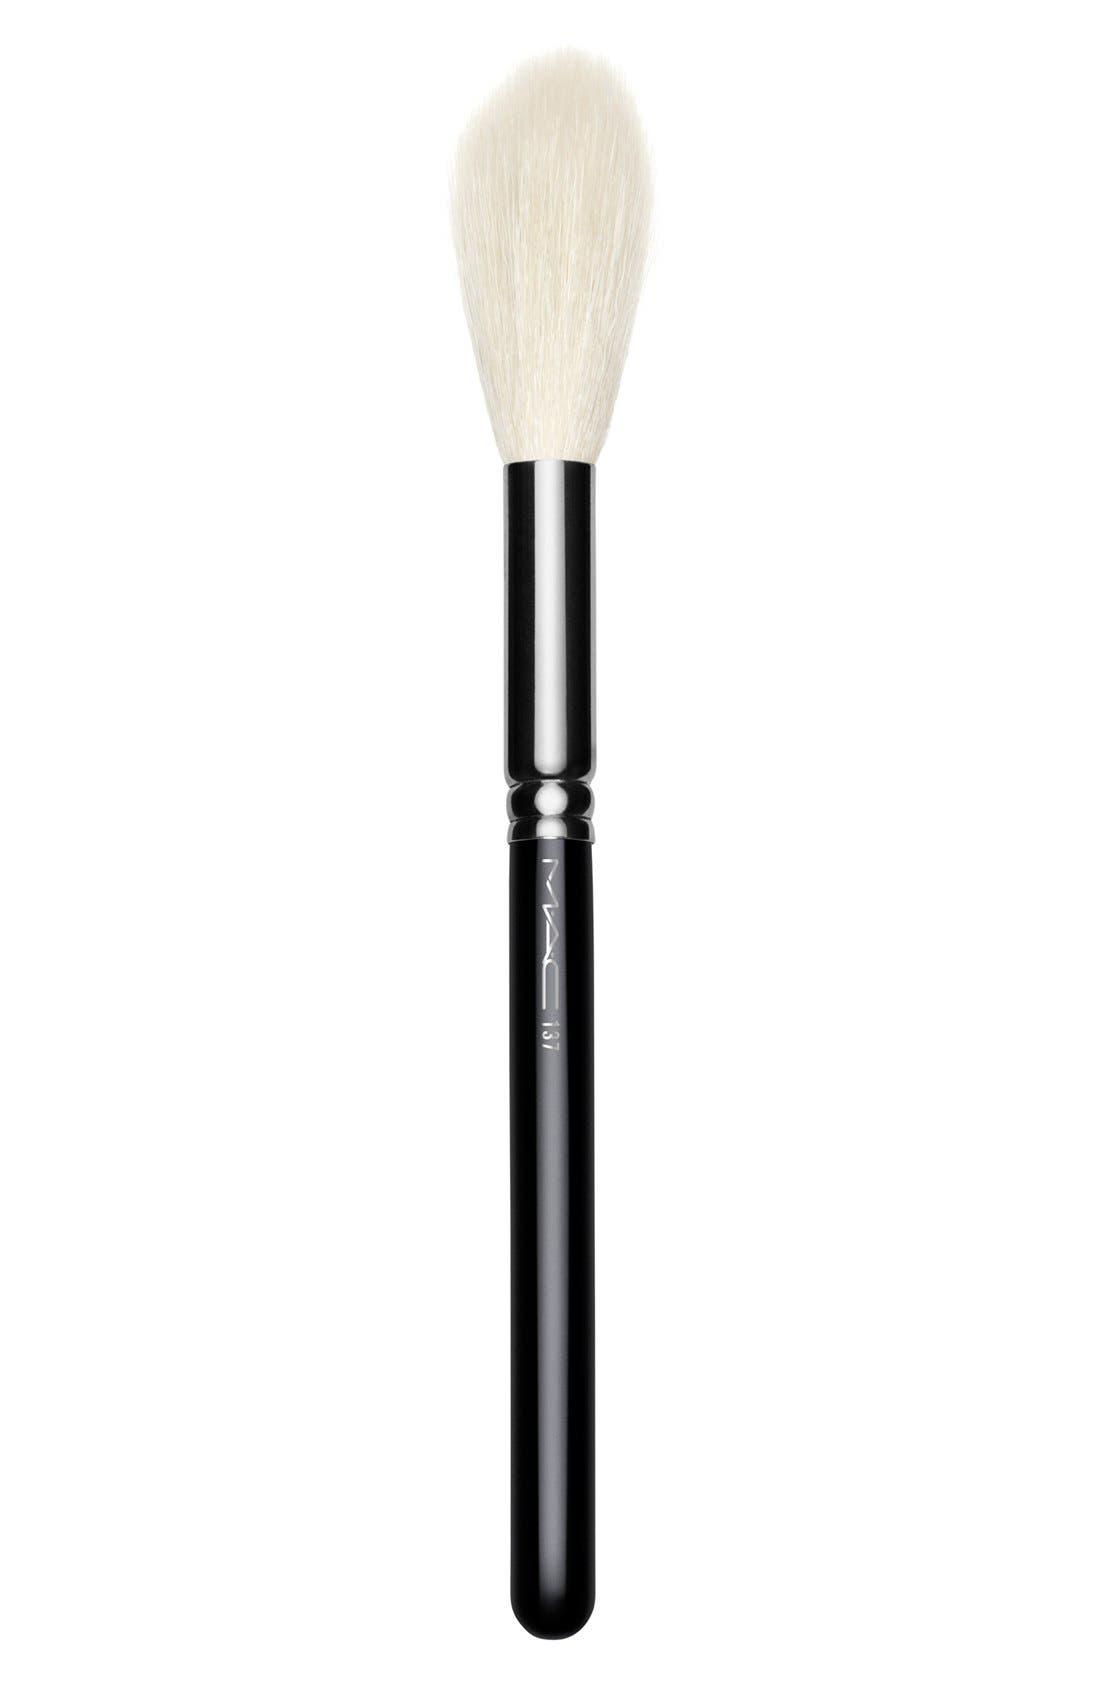 MAC 137 Long Blending Brush,                             Main thumbnail 1, color,                             000